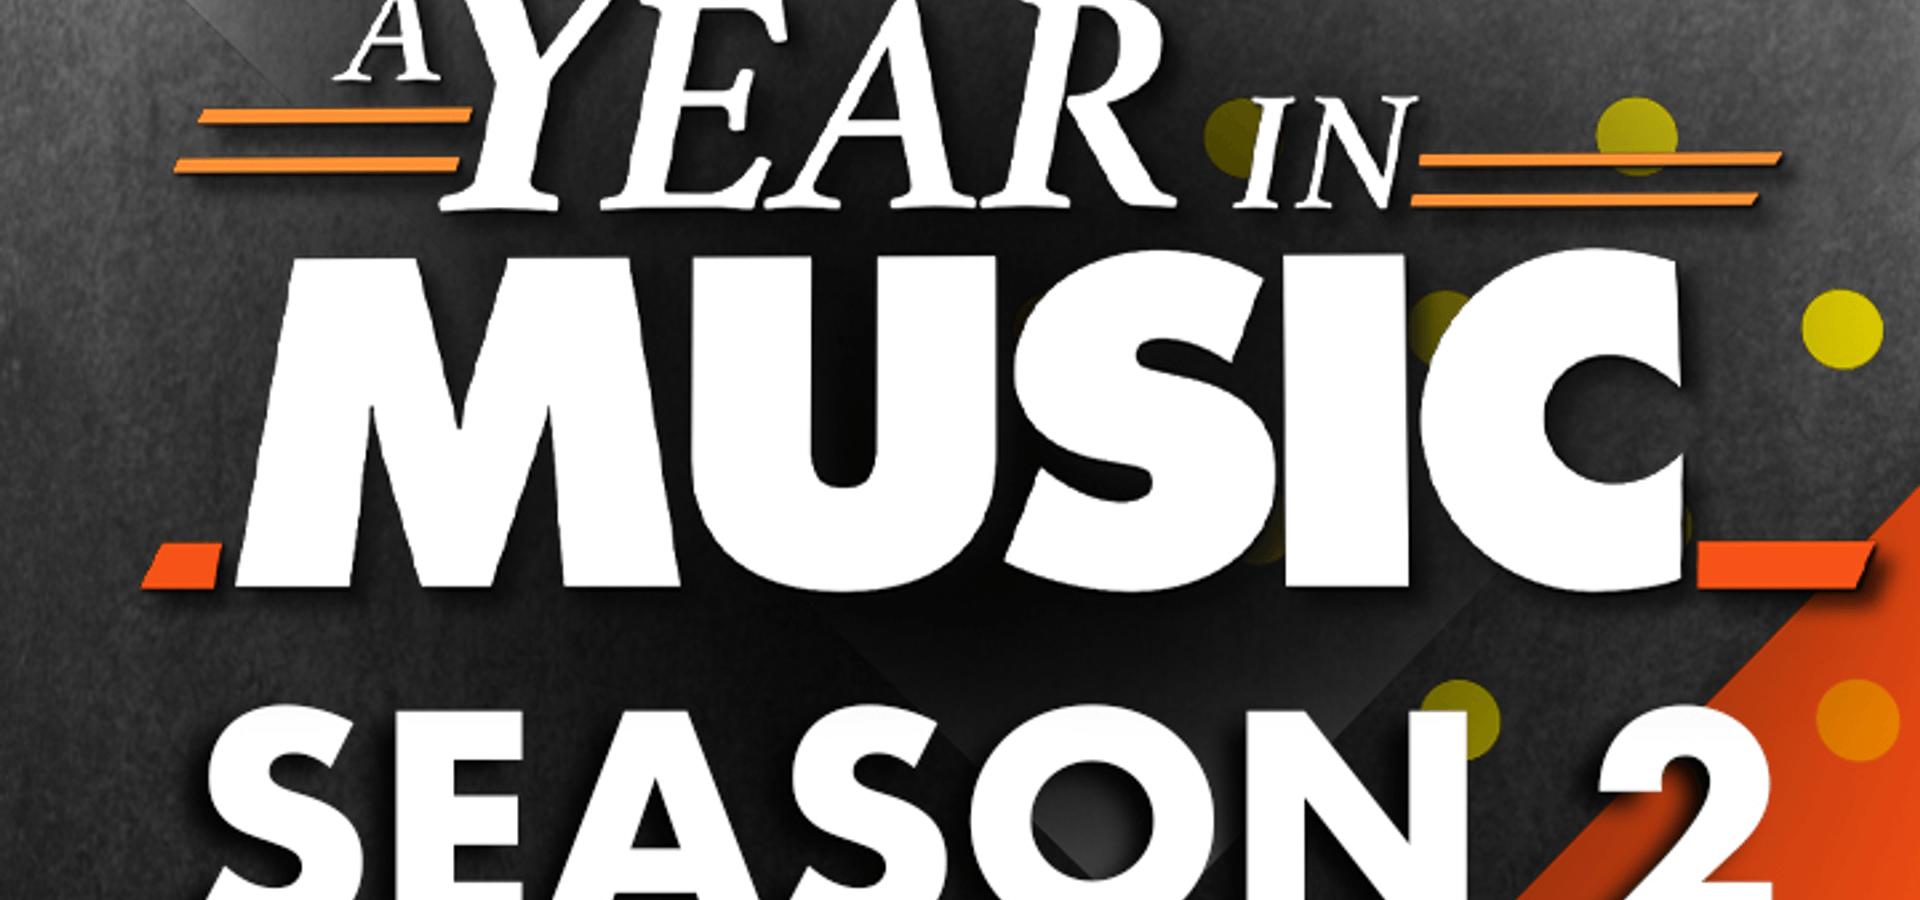 A Year in Music Season 2